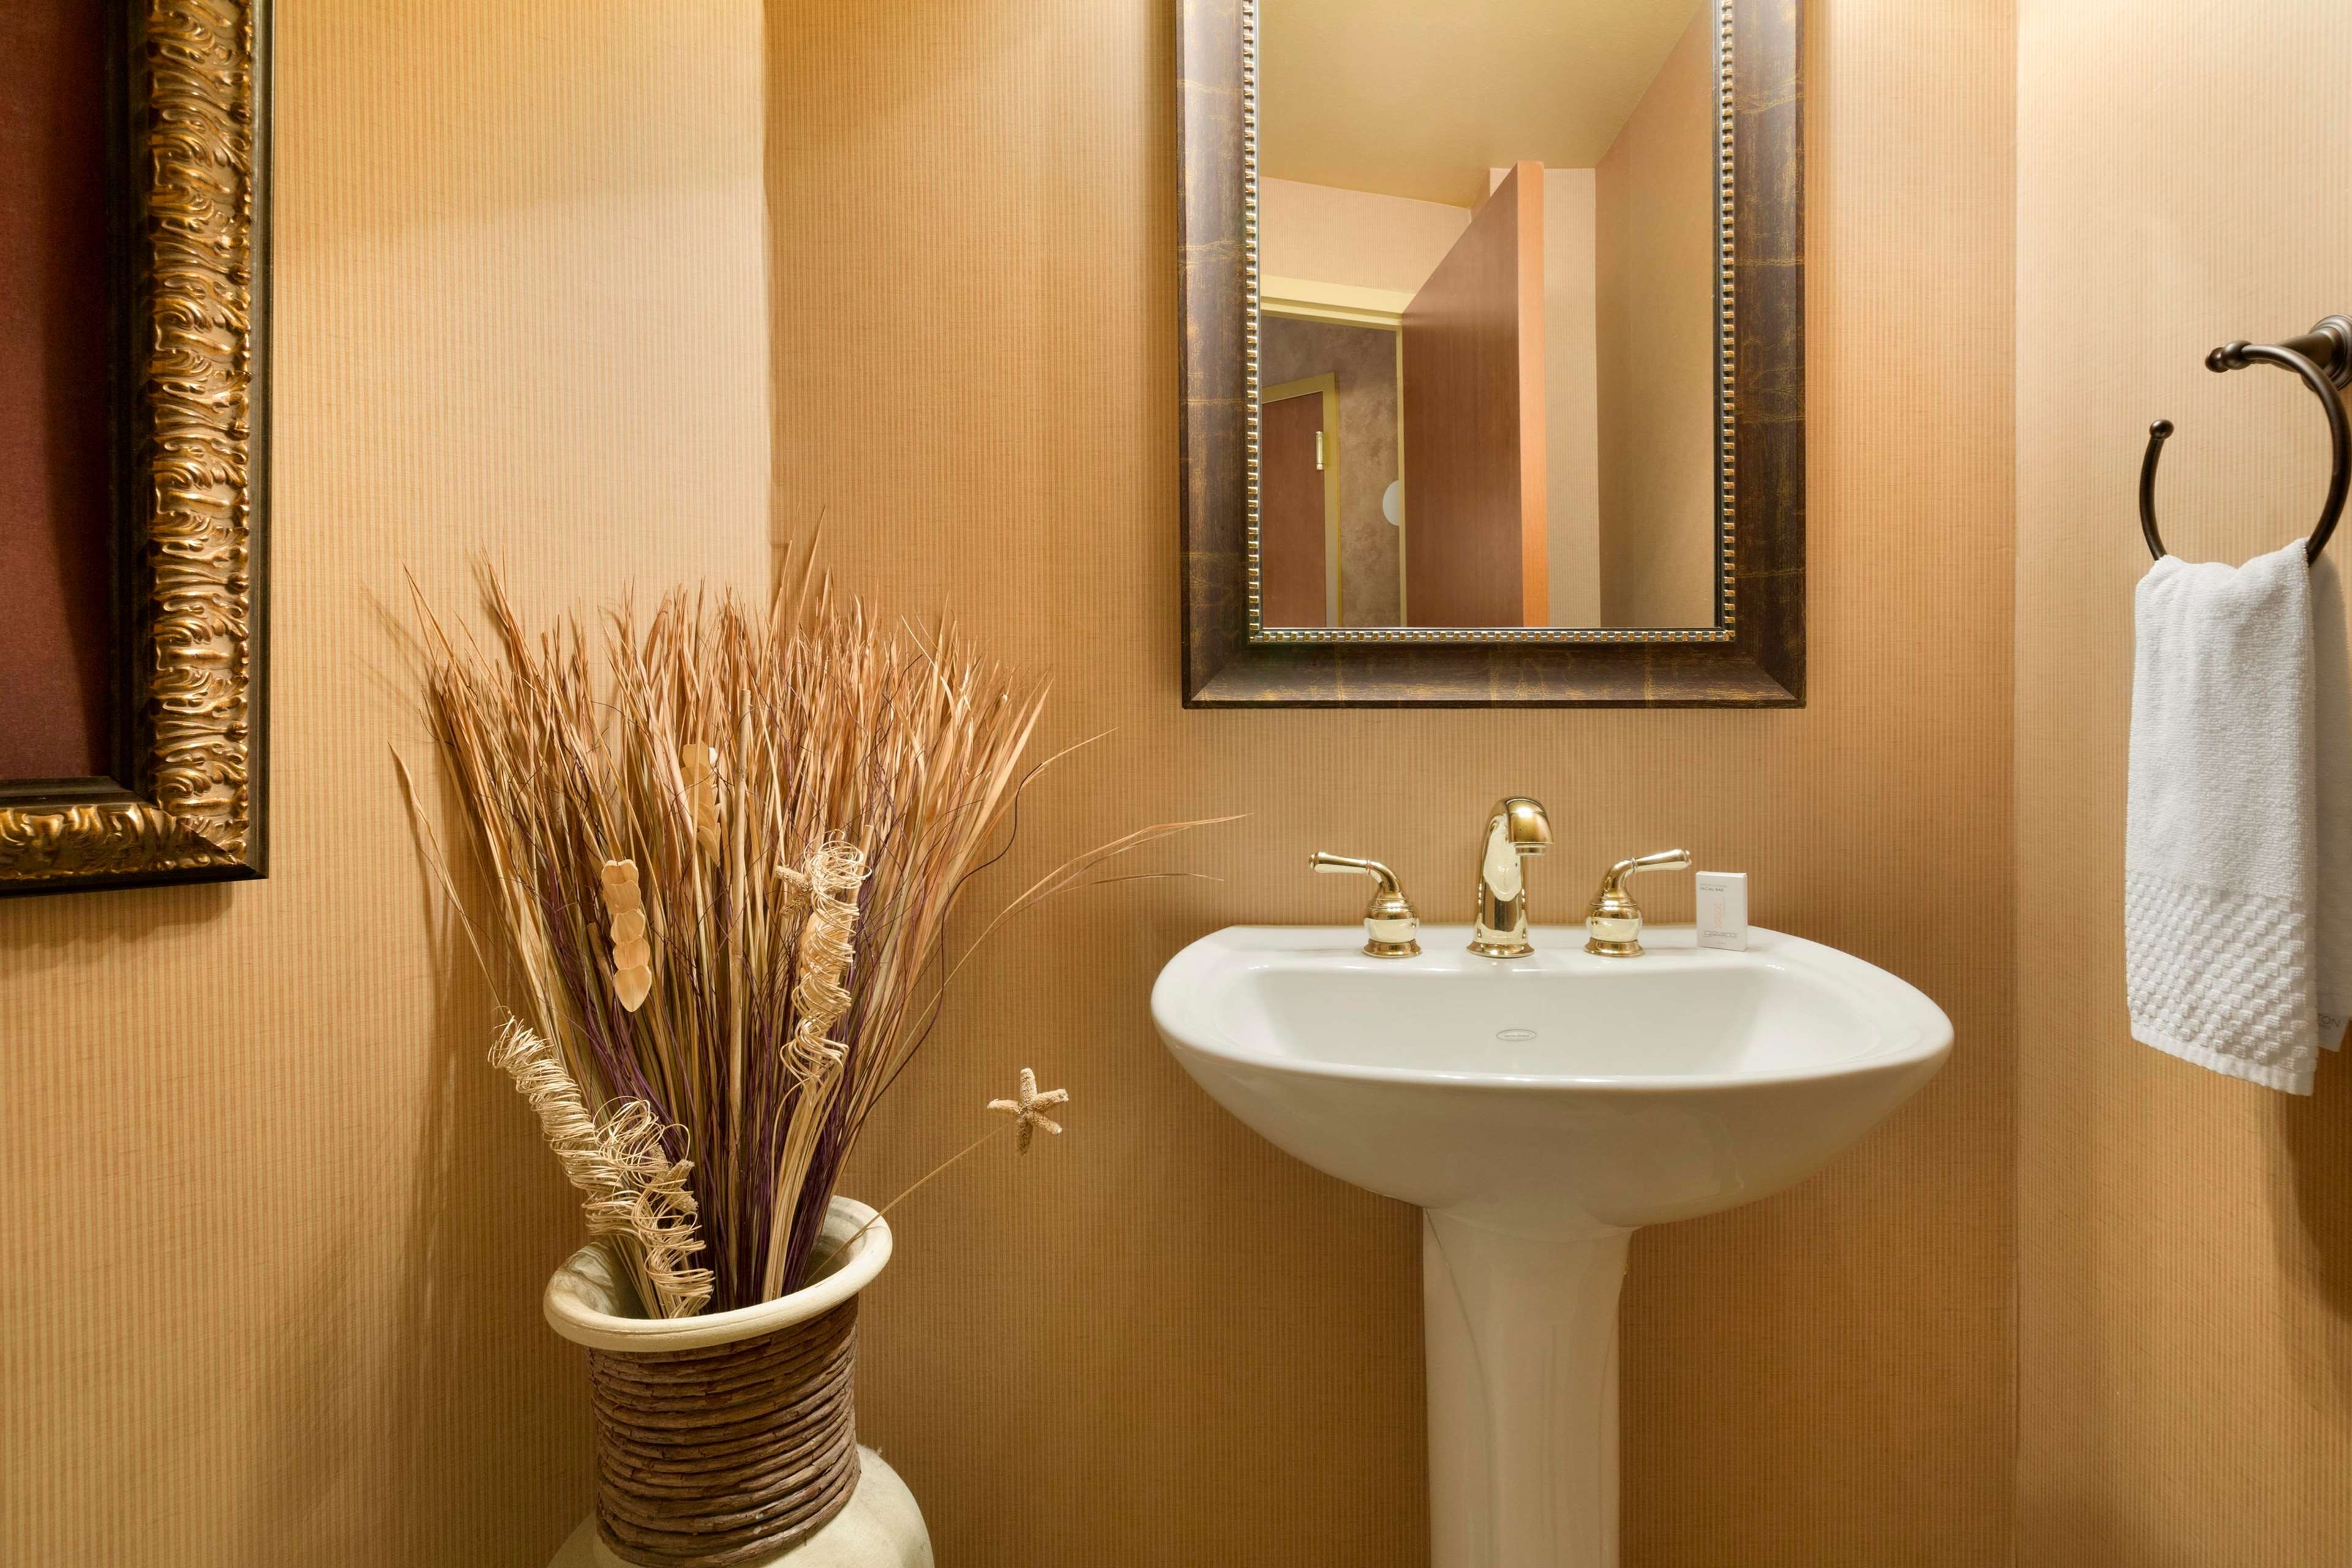 Embassy Suites by Hilton Albuquerque Hotel & Spa image 14